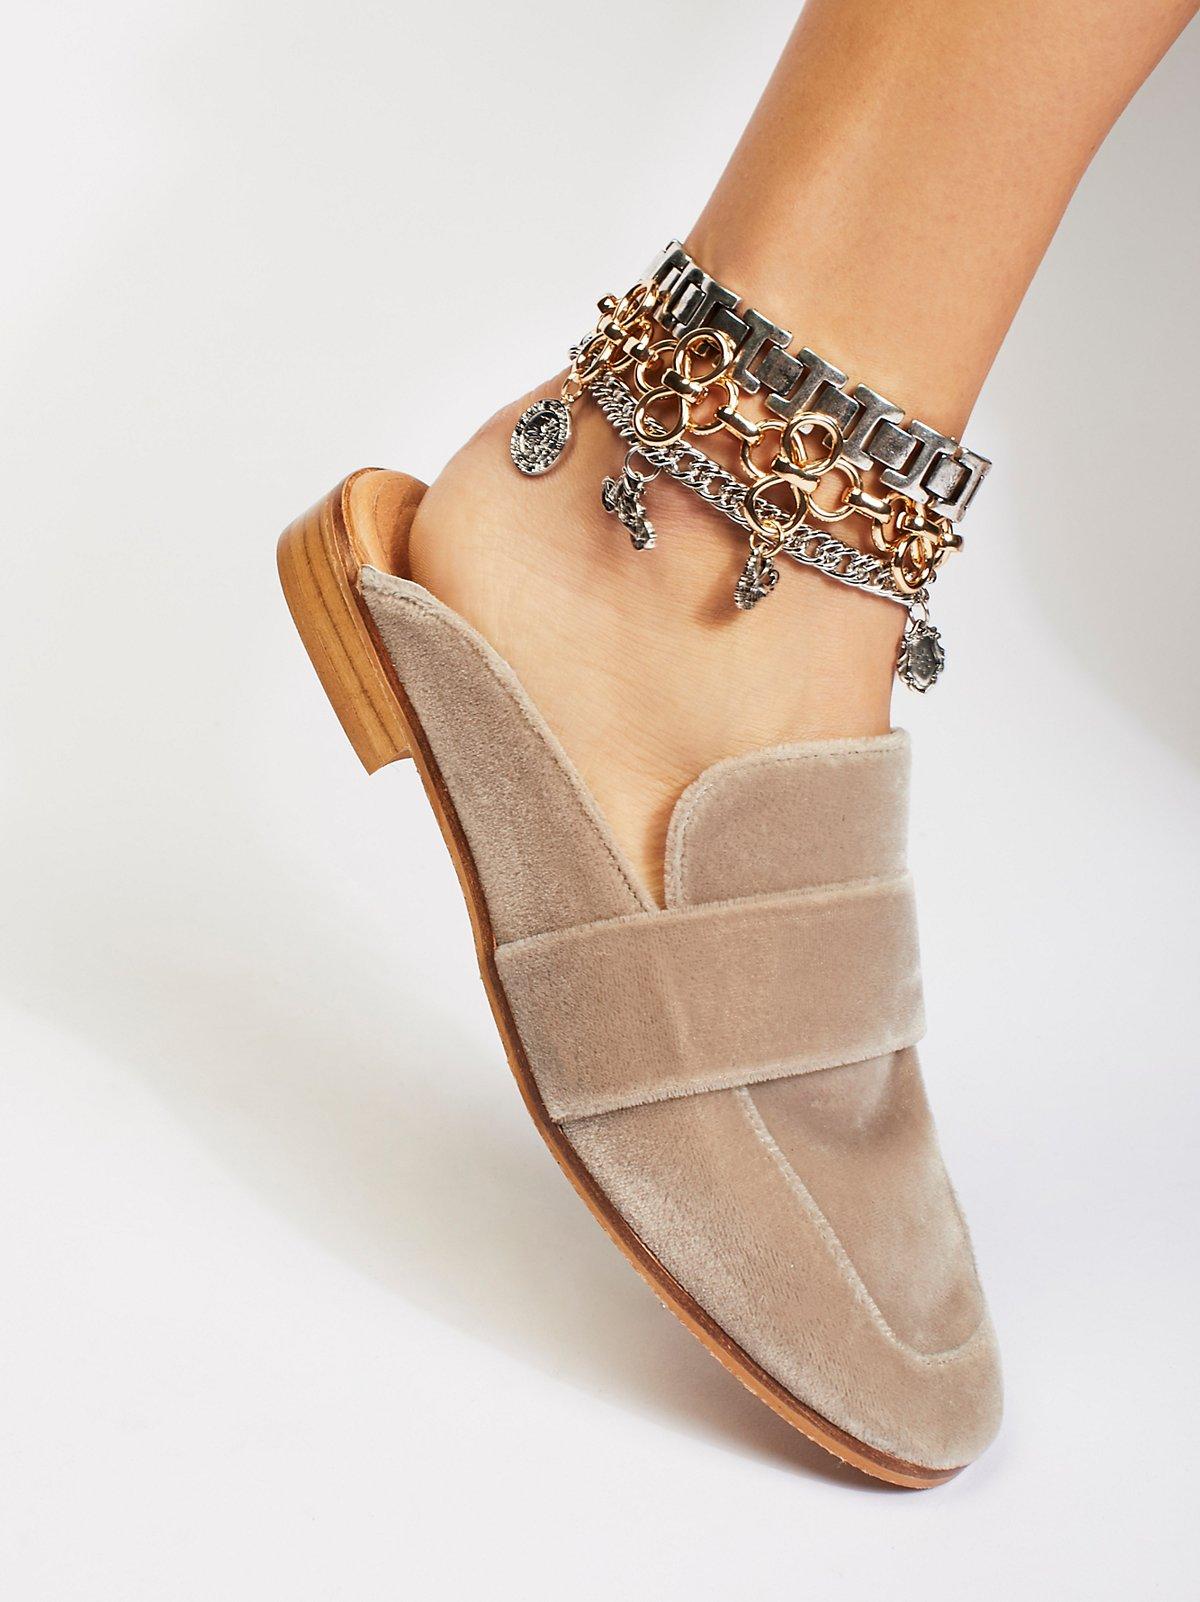 Triple Charm Anklet Set